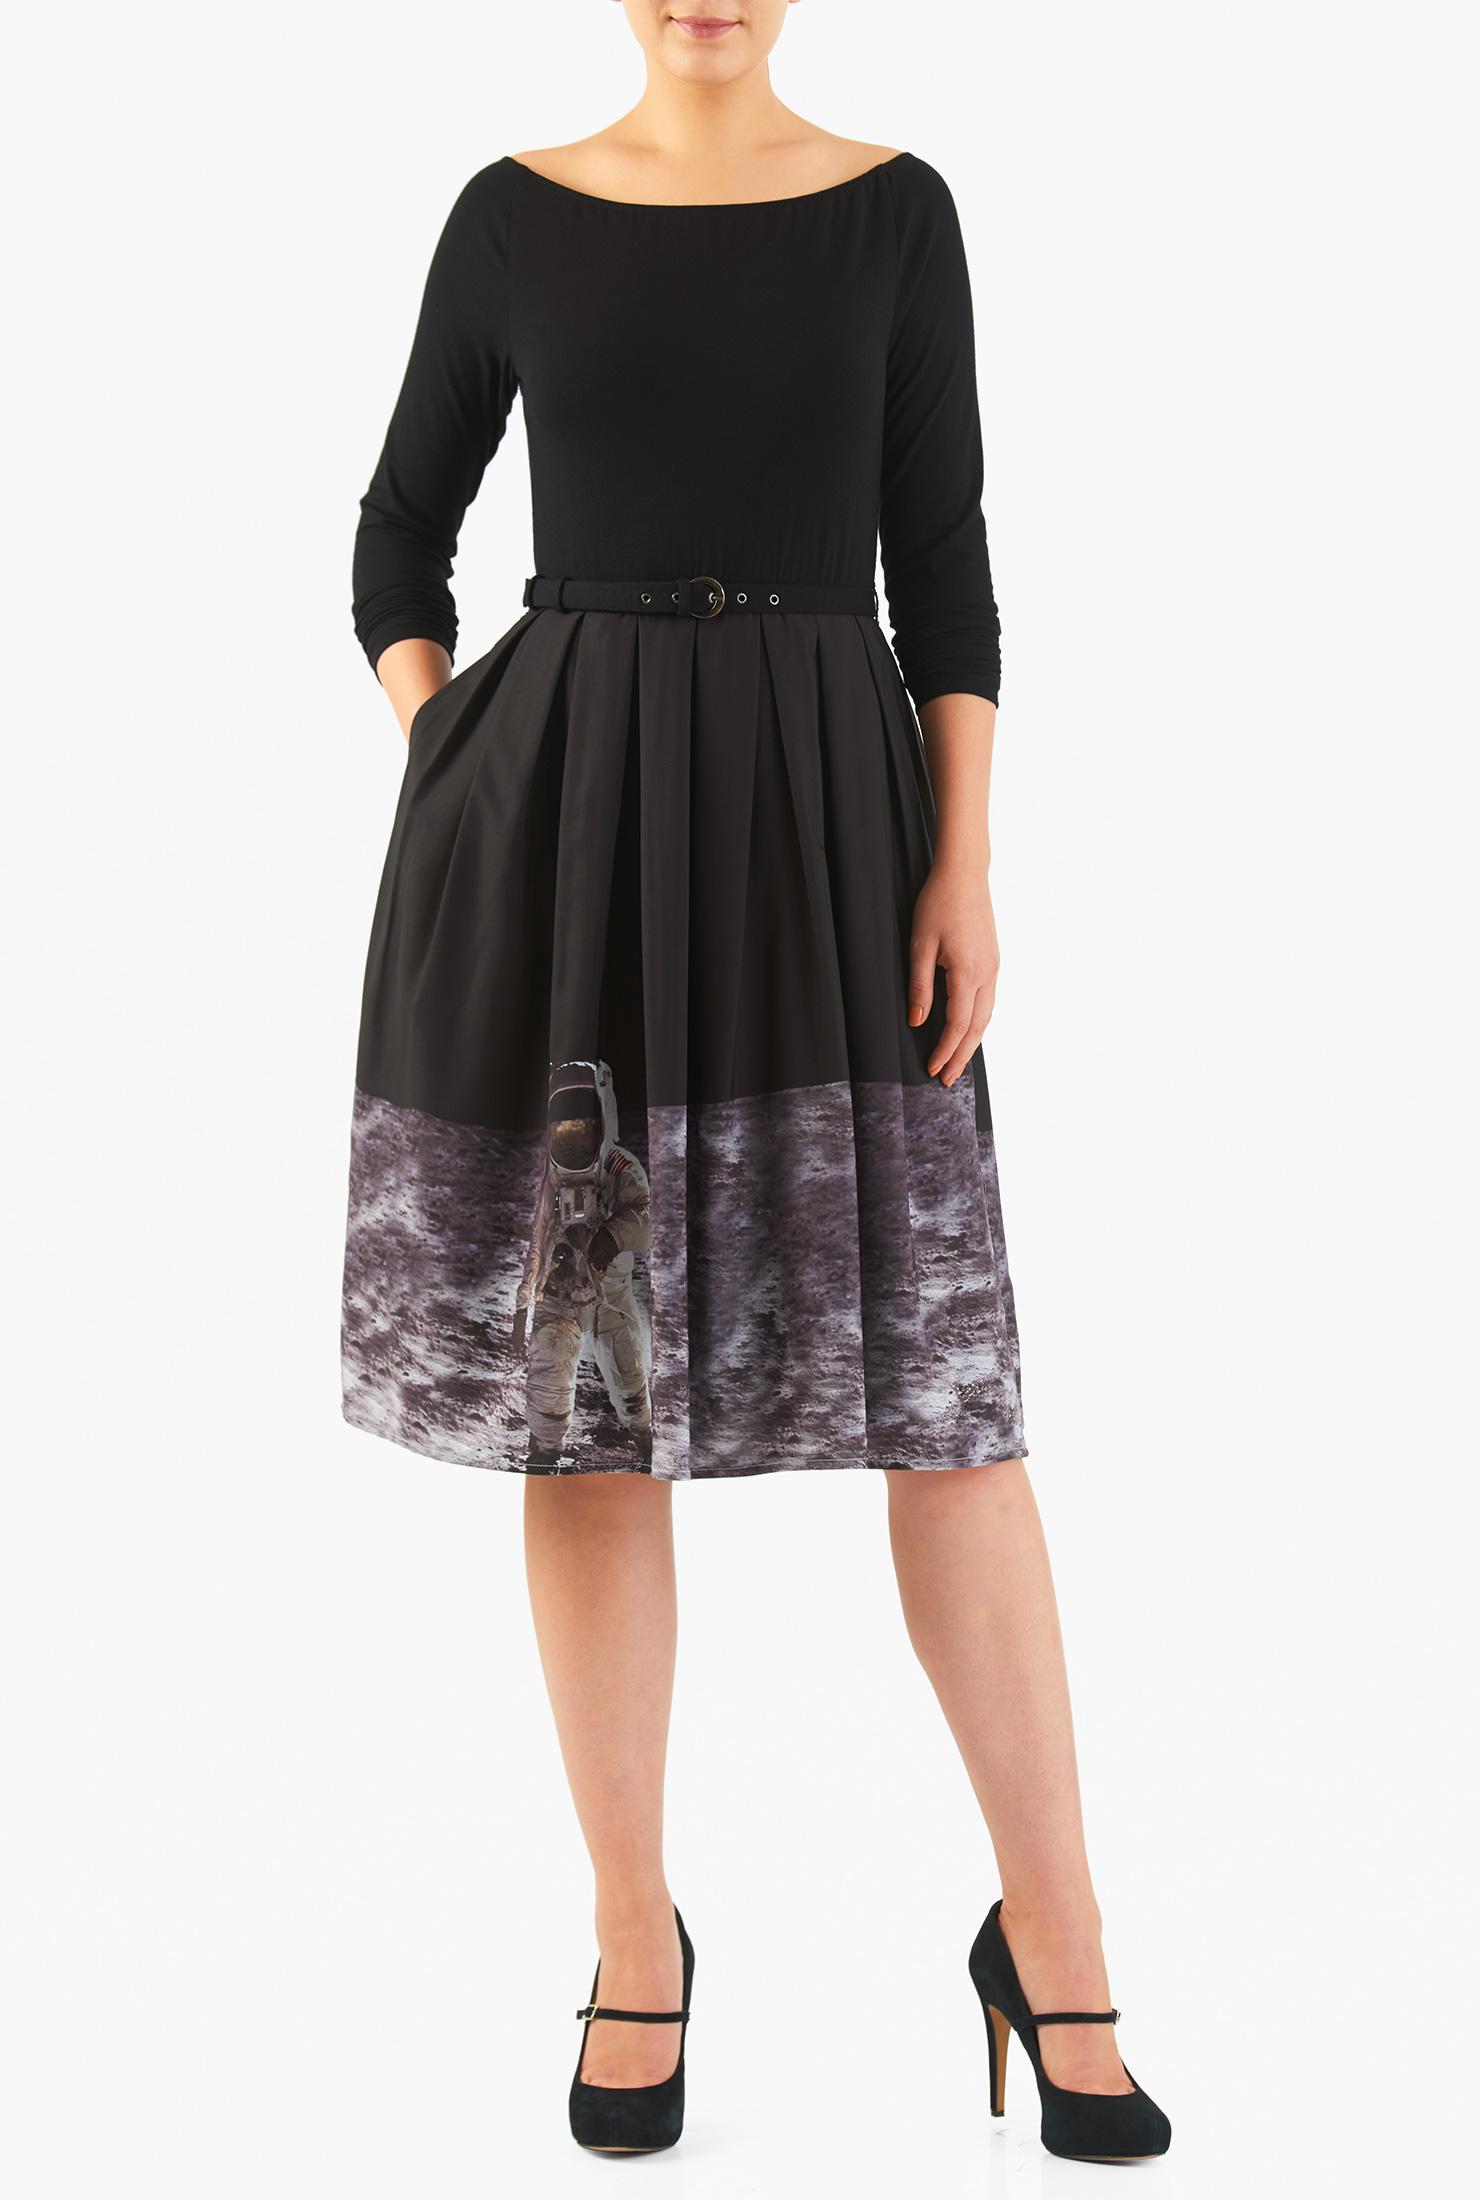 Image of eShakti Women's Astronaut space print belted mixed media dress